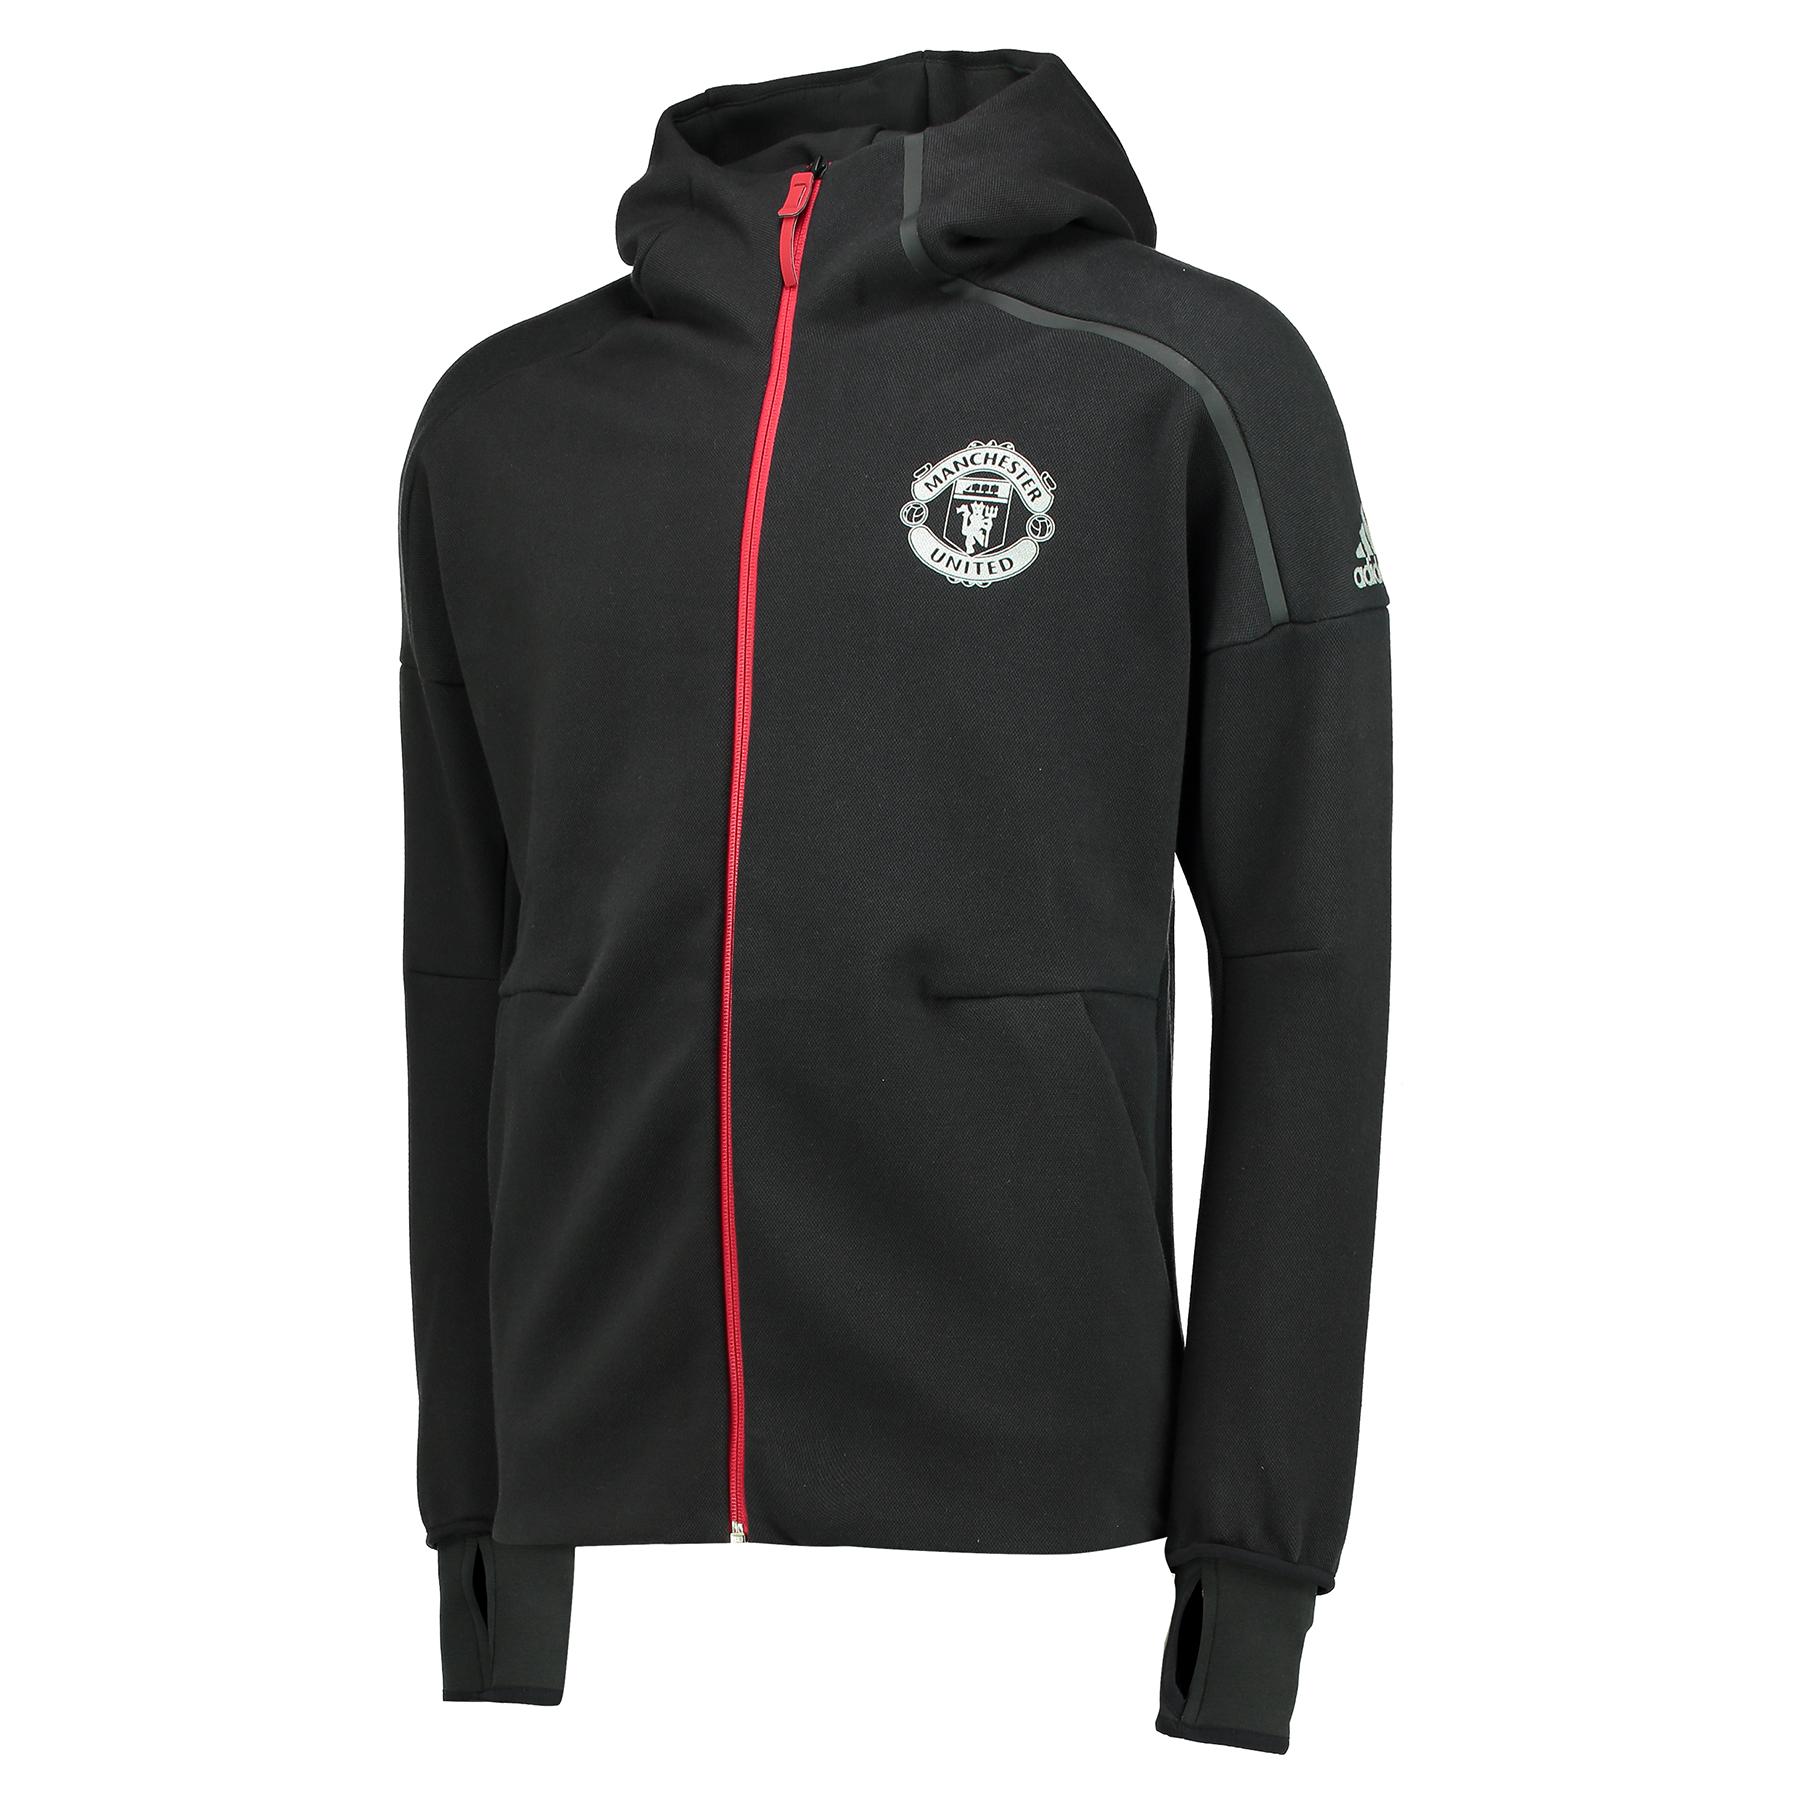 Manchester United ZNE Anthem Jacket - Black